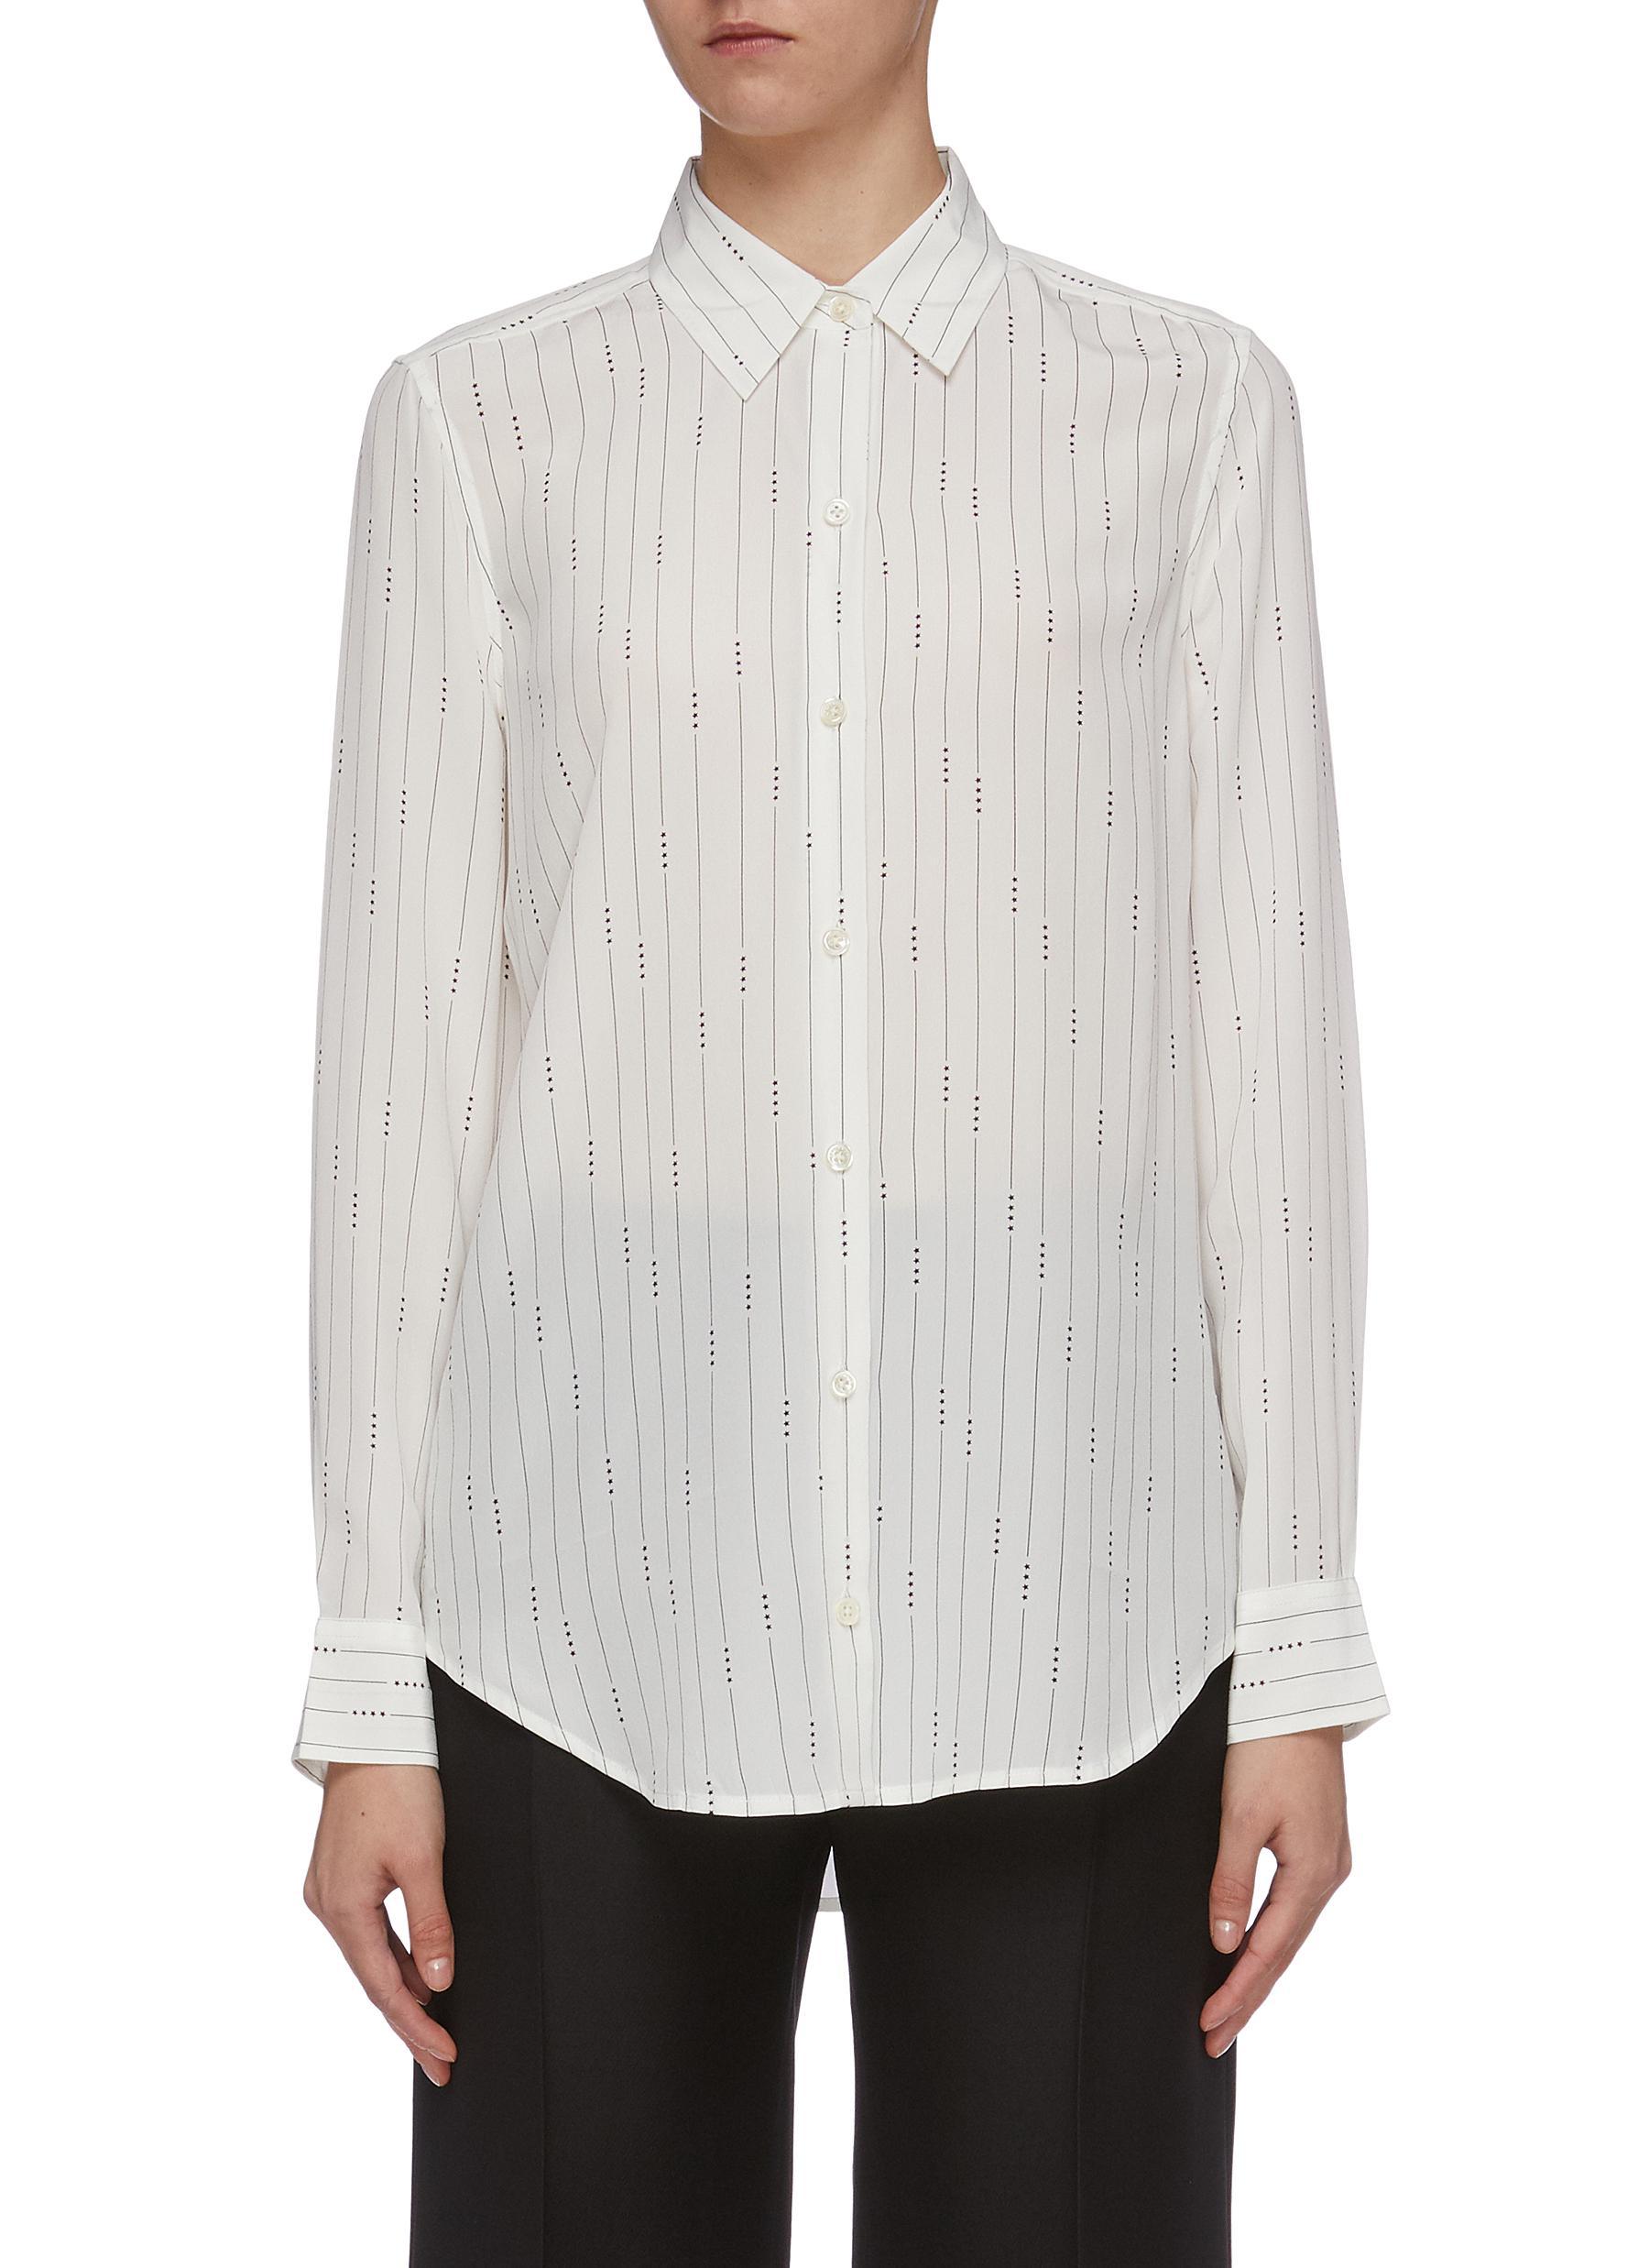 Essential star pinstripe silk shirt by Equipment